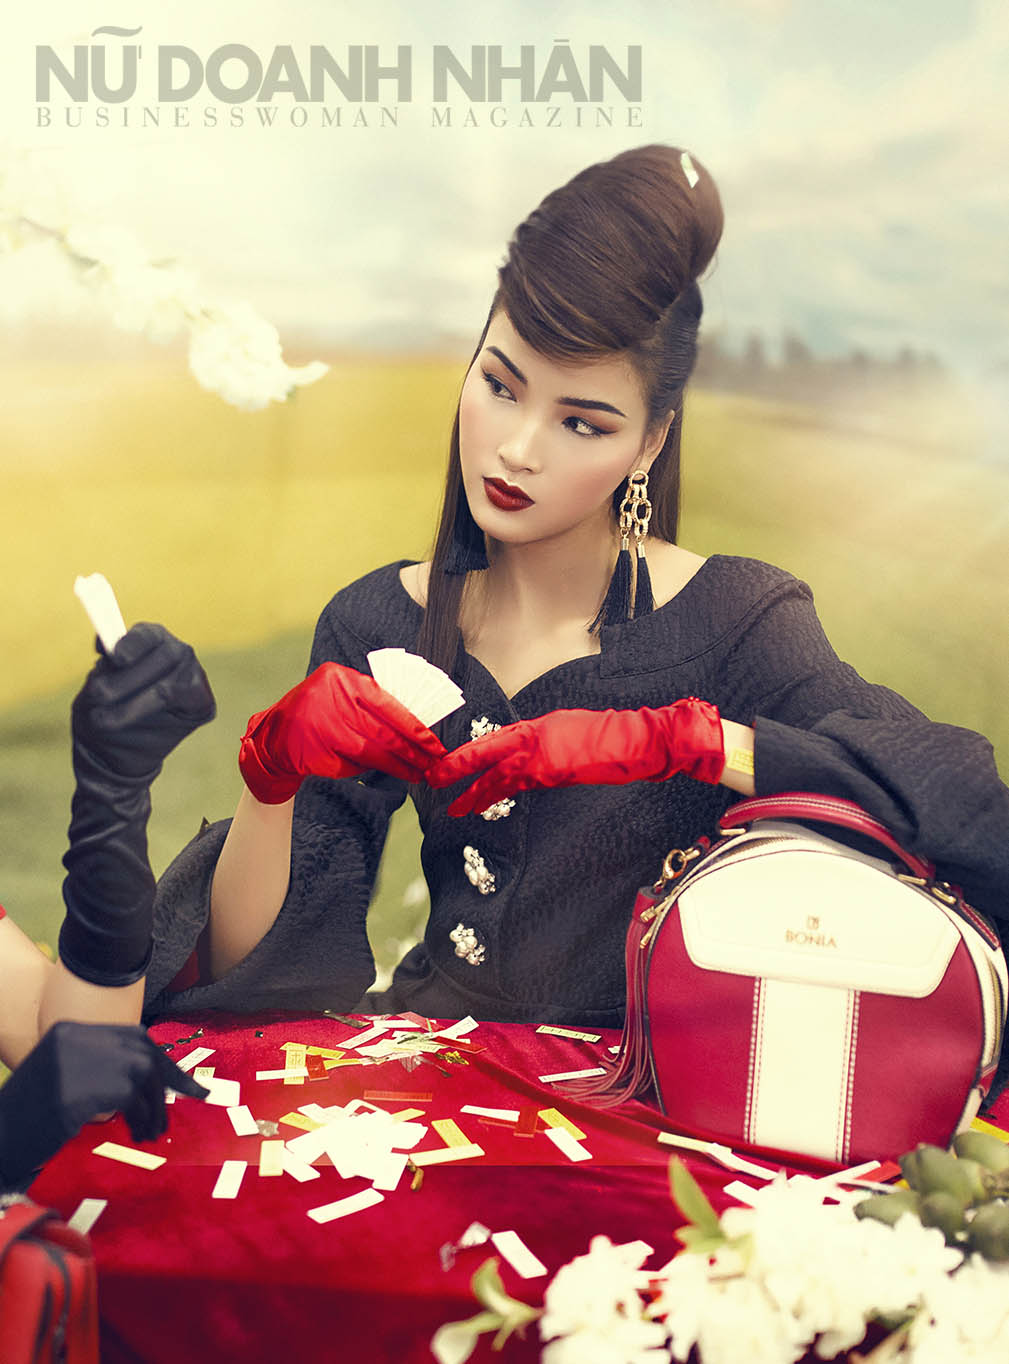 NDN_Wedsite_fashion nguoi mau_12